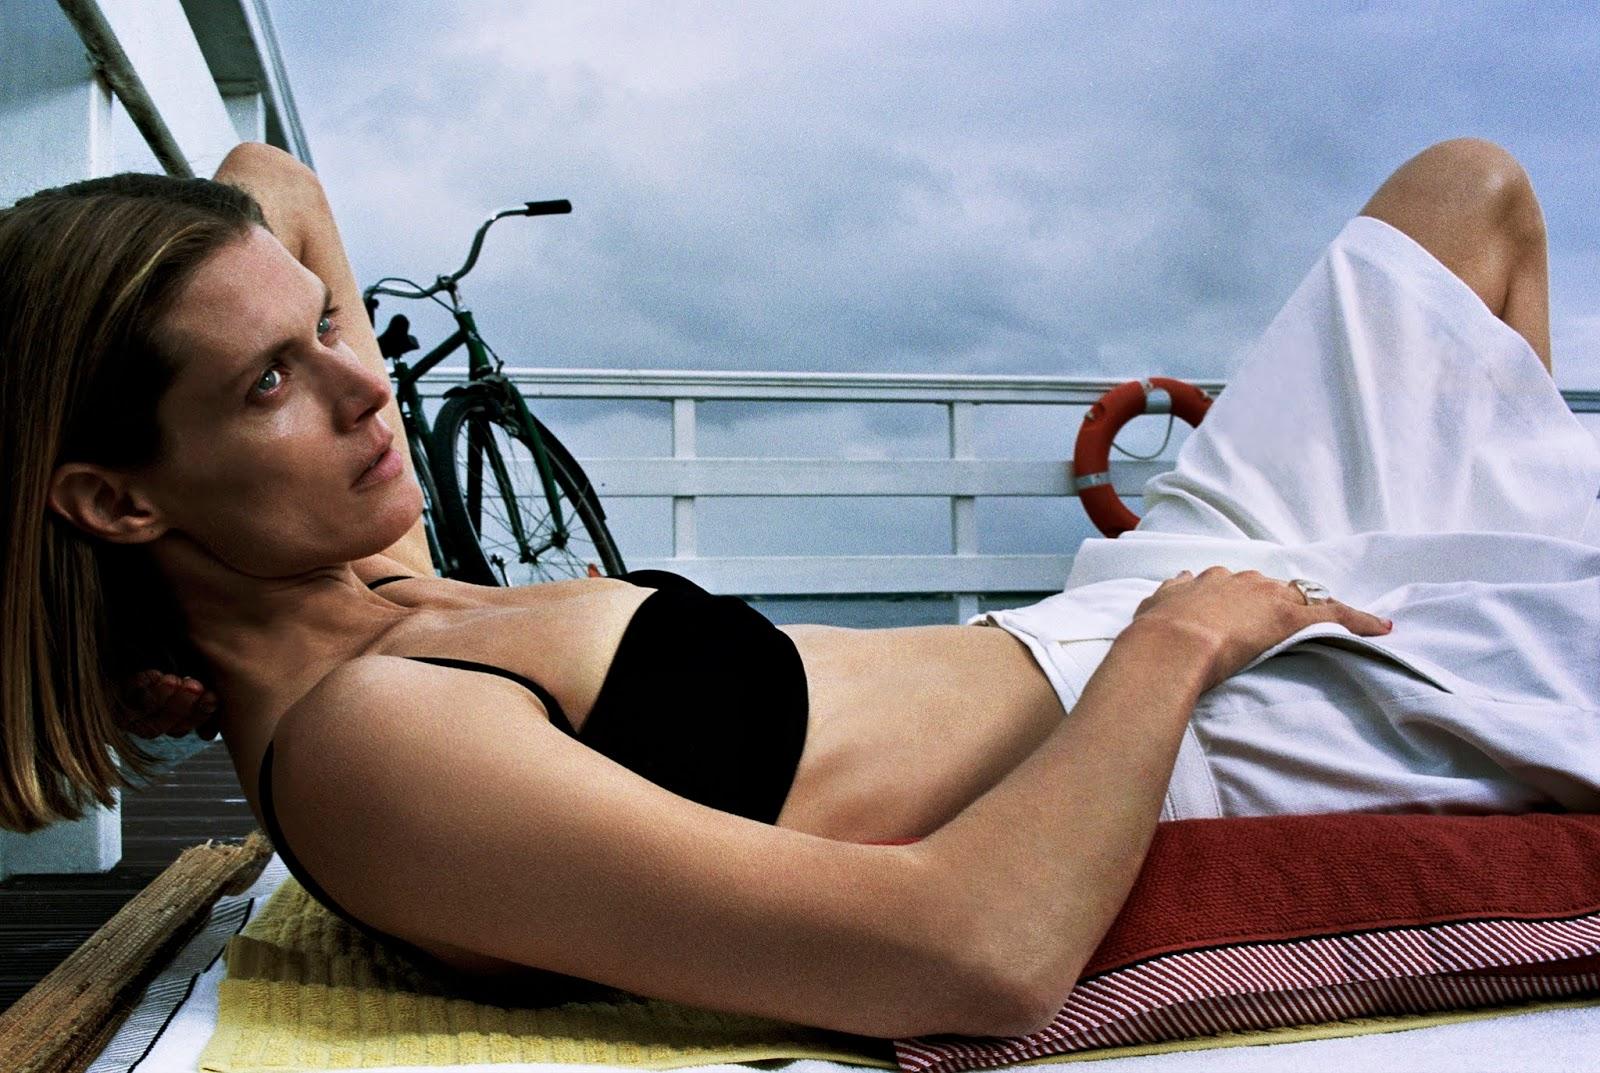 Bikini top Haight; shorts Vince; ring Malgosia's own. Malgosia Bela by Hugo Comte.